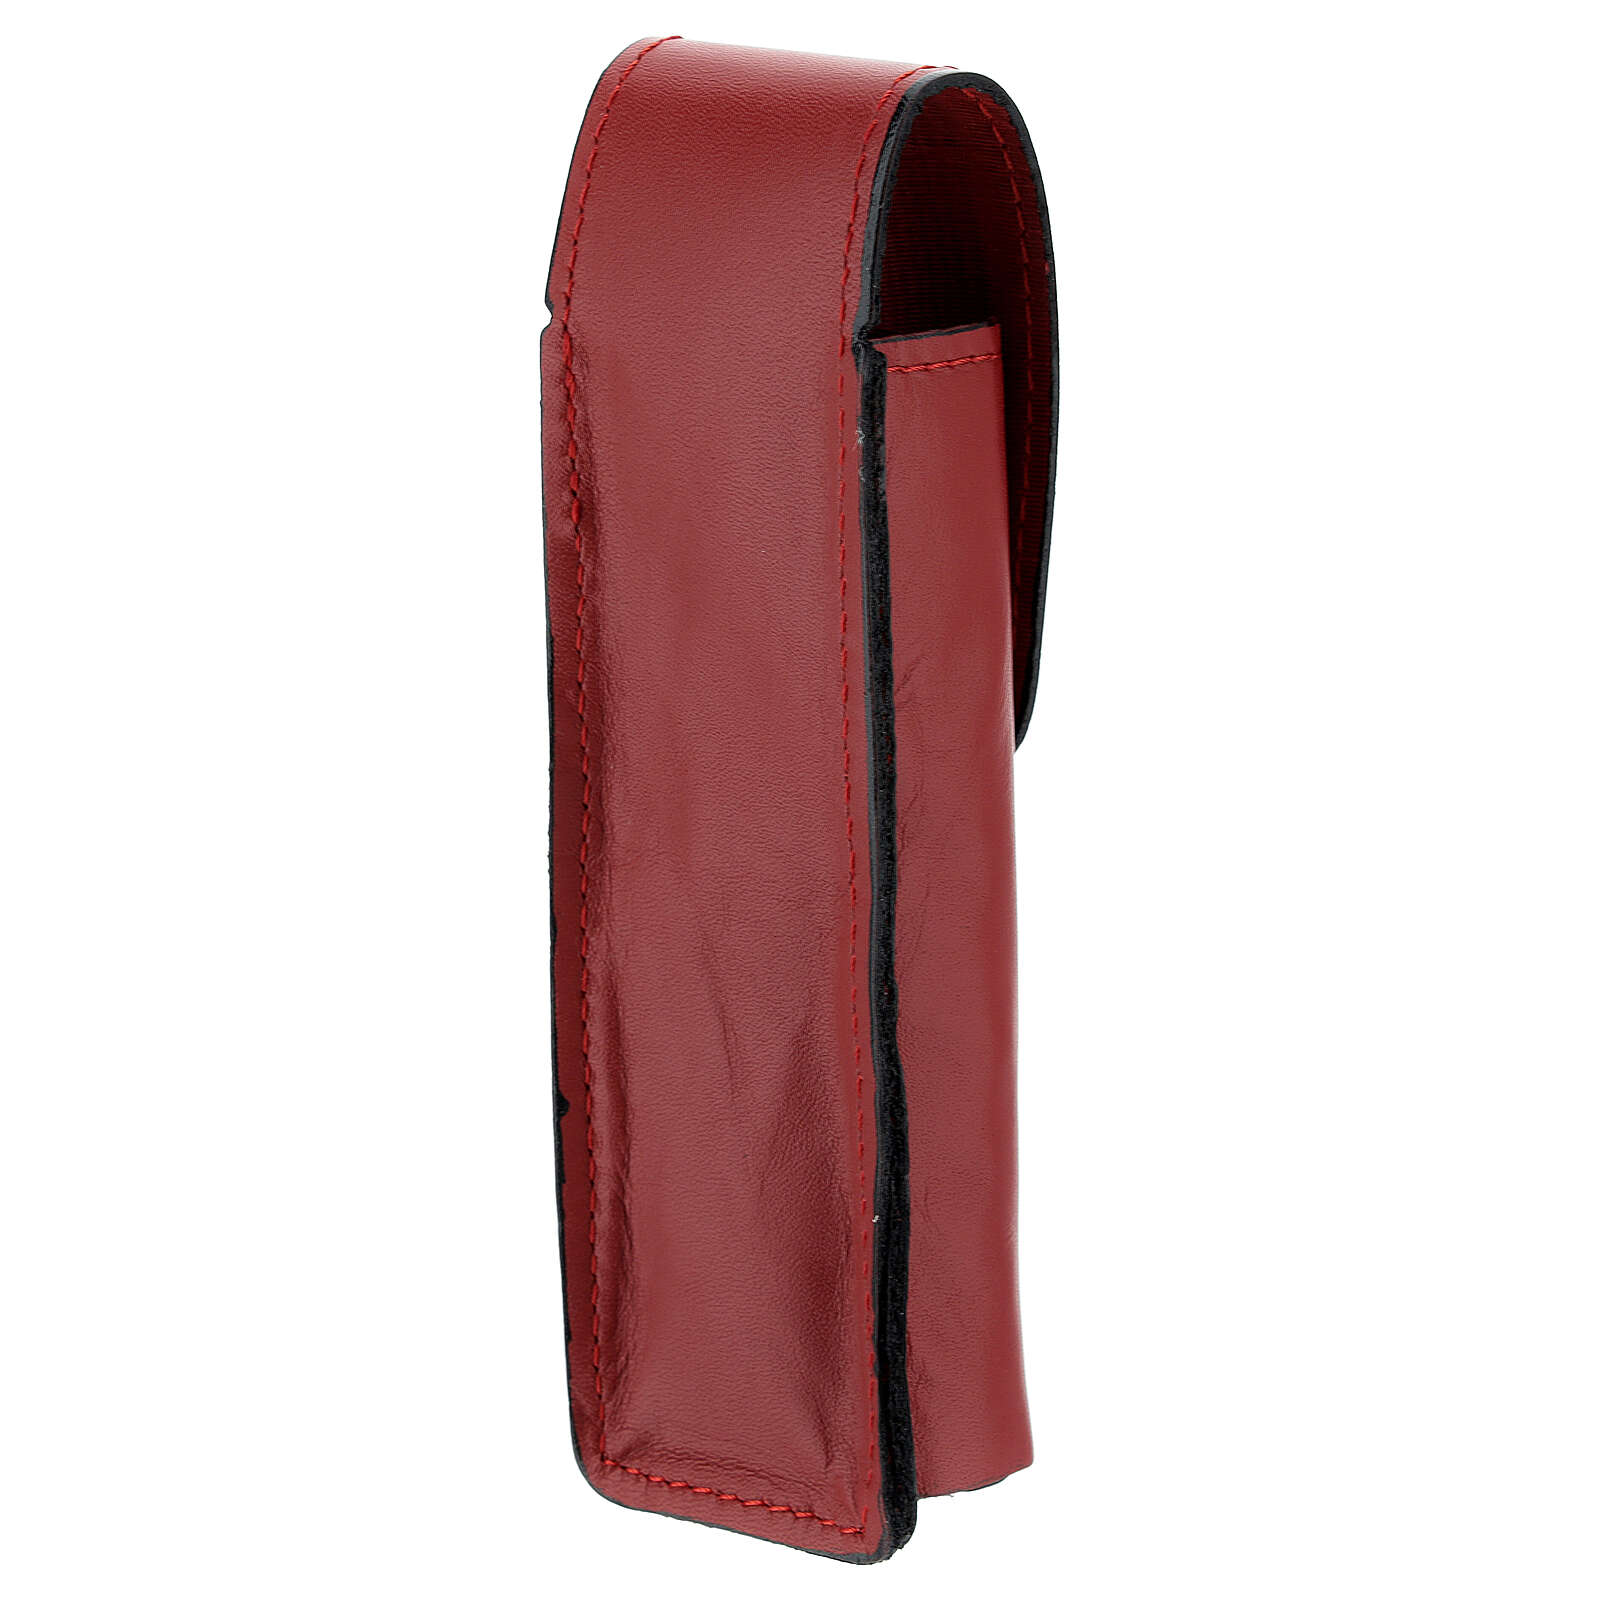 Sprinkler case 5 in real red leather 3